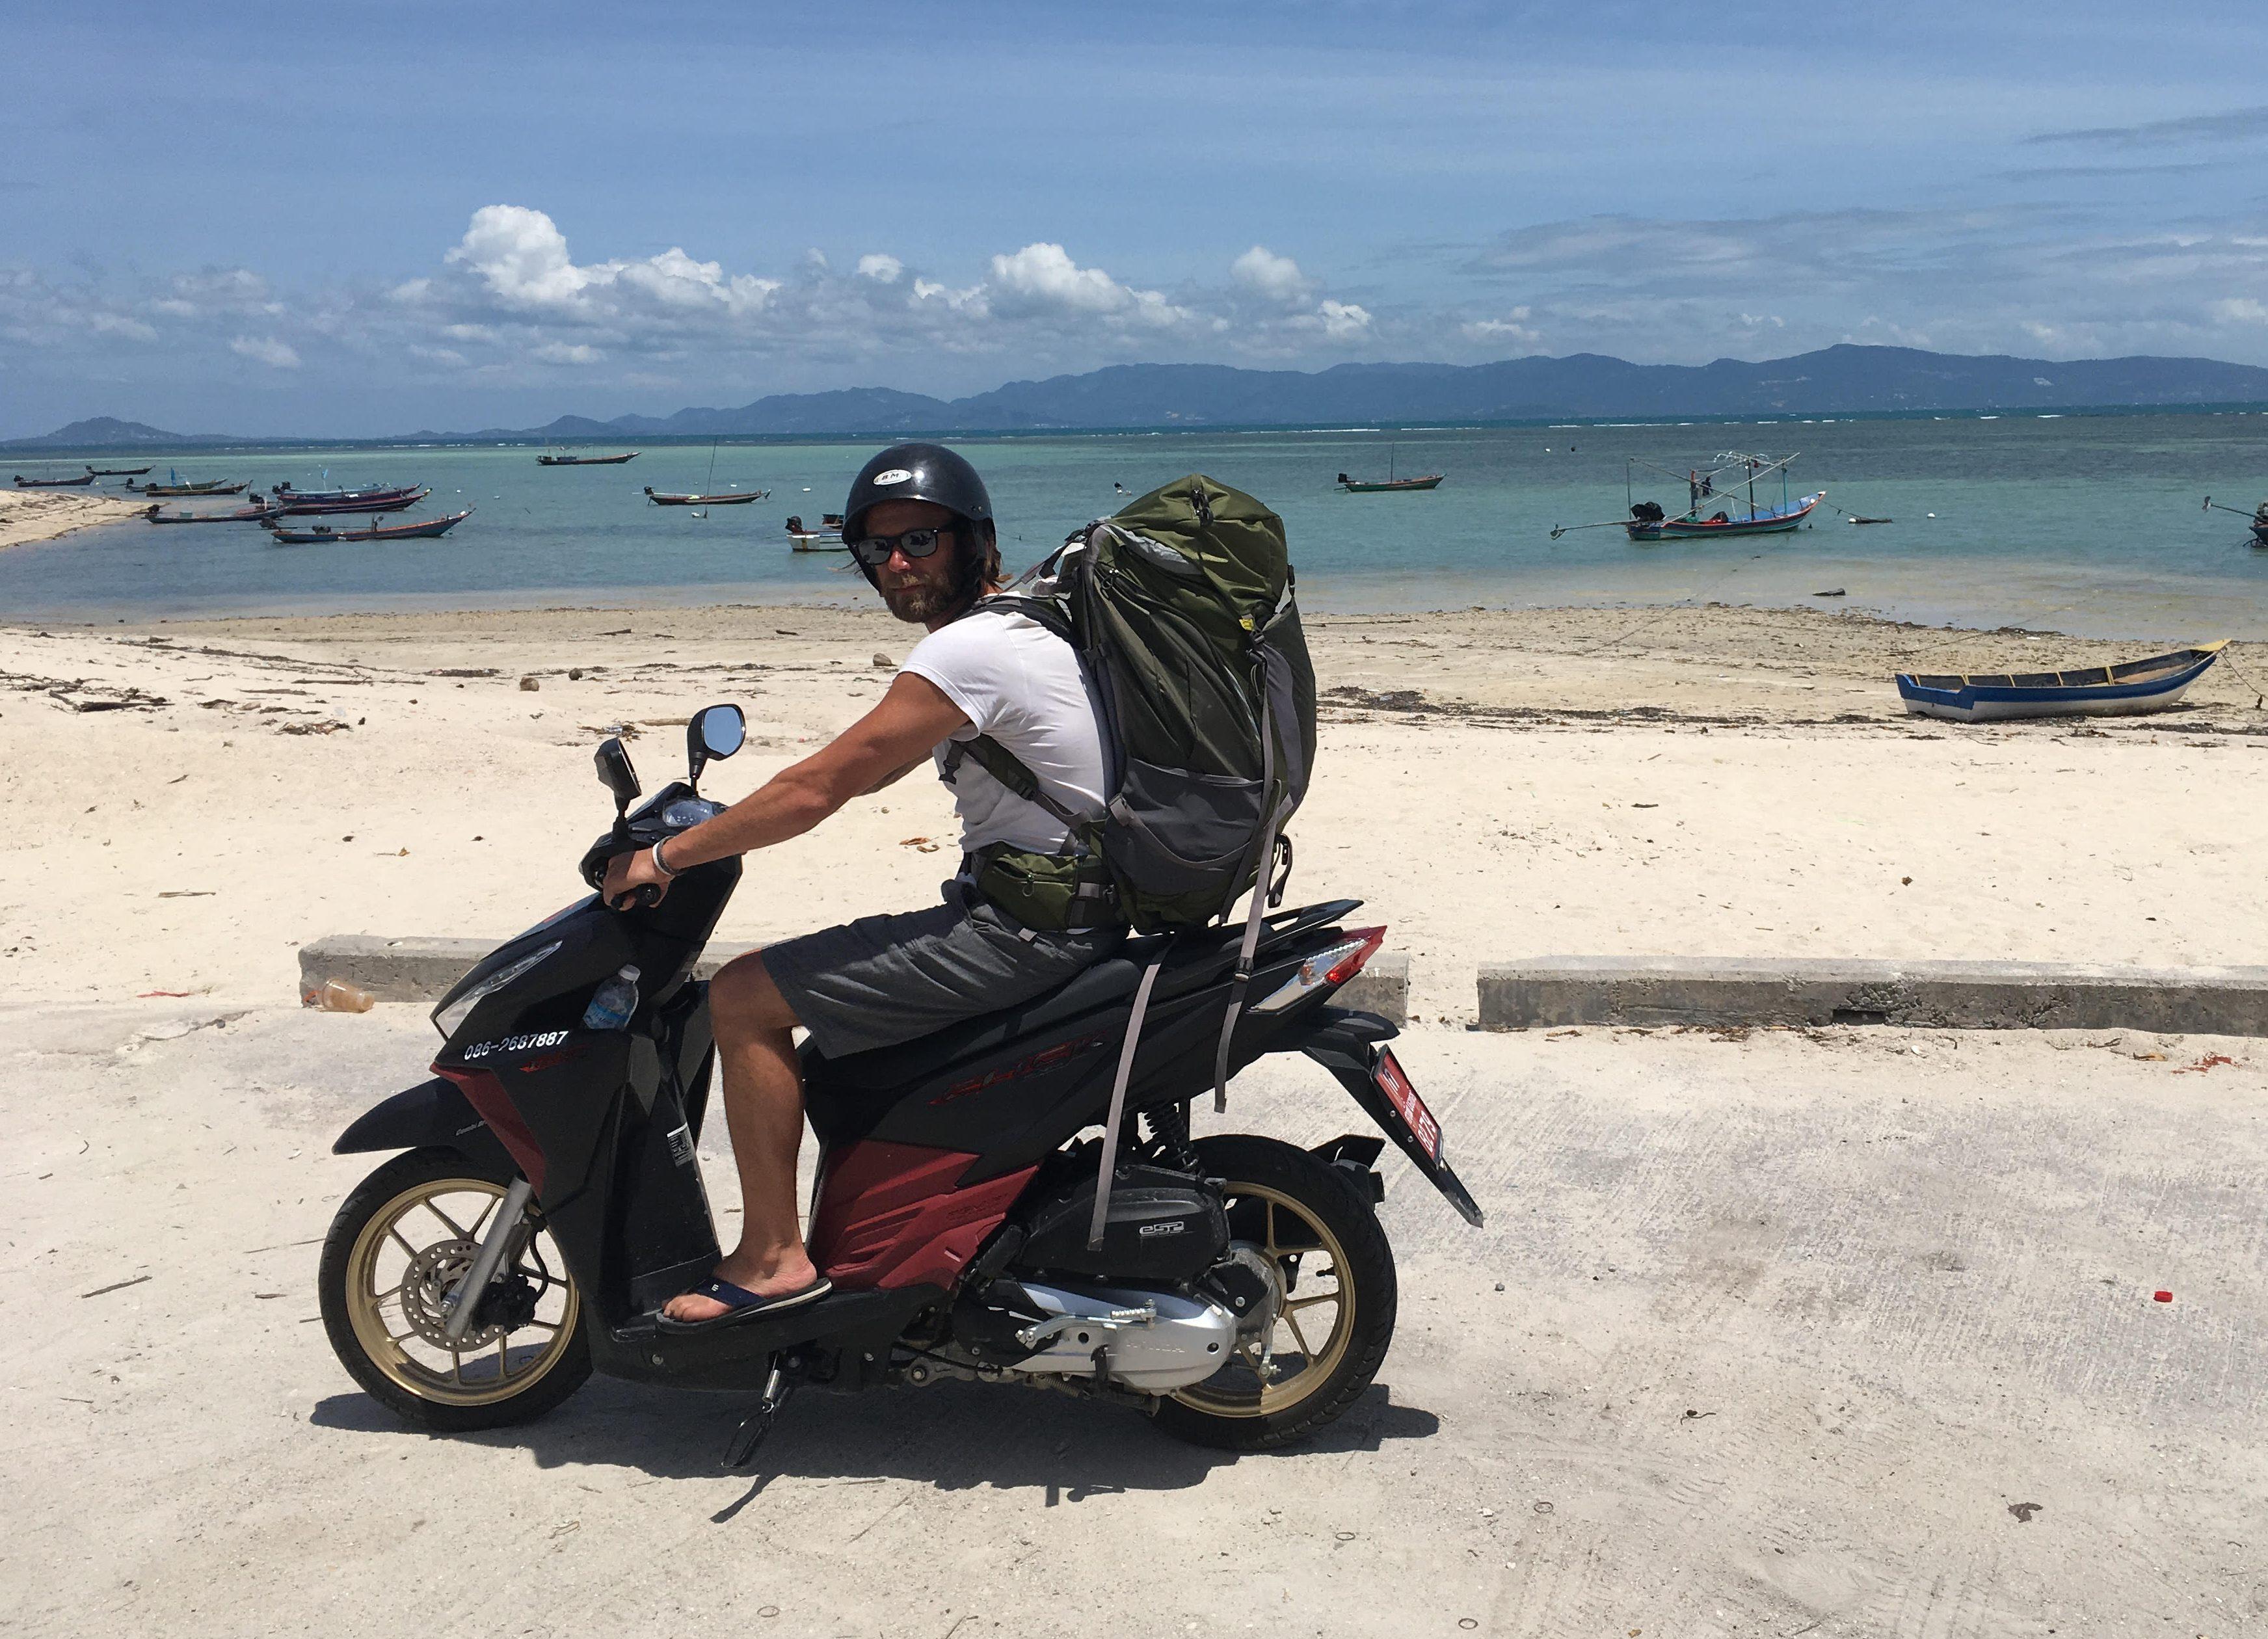 islatortugadivers.com koh tao mochileros moto llegando a destino